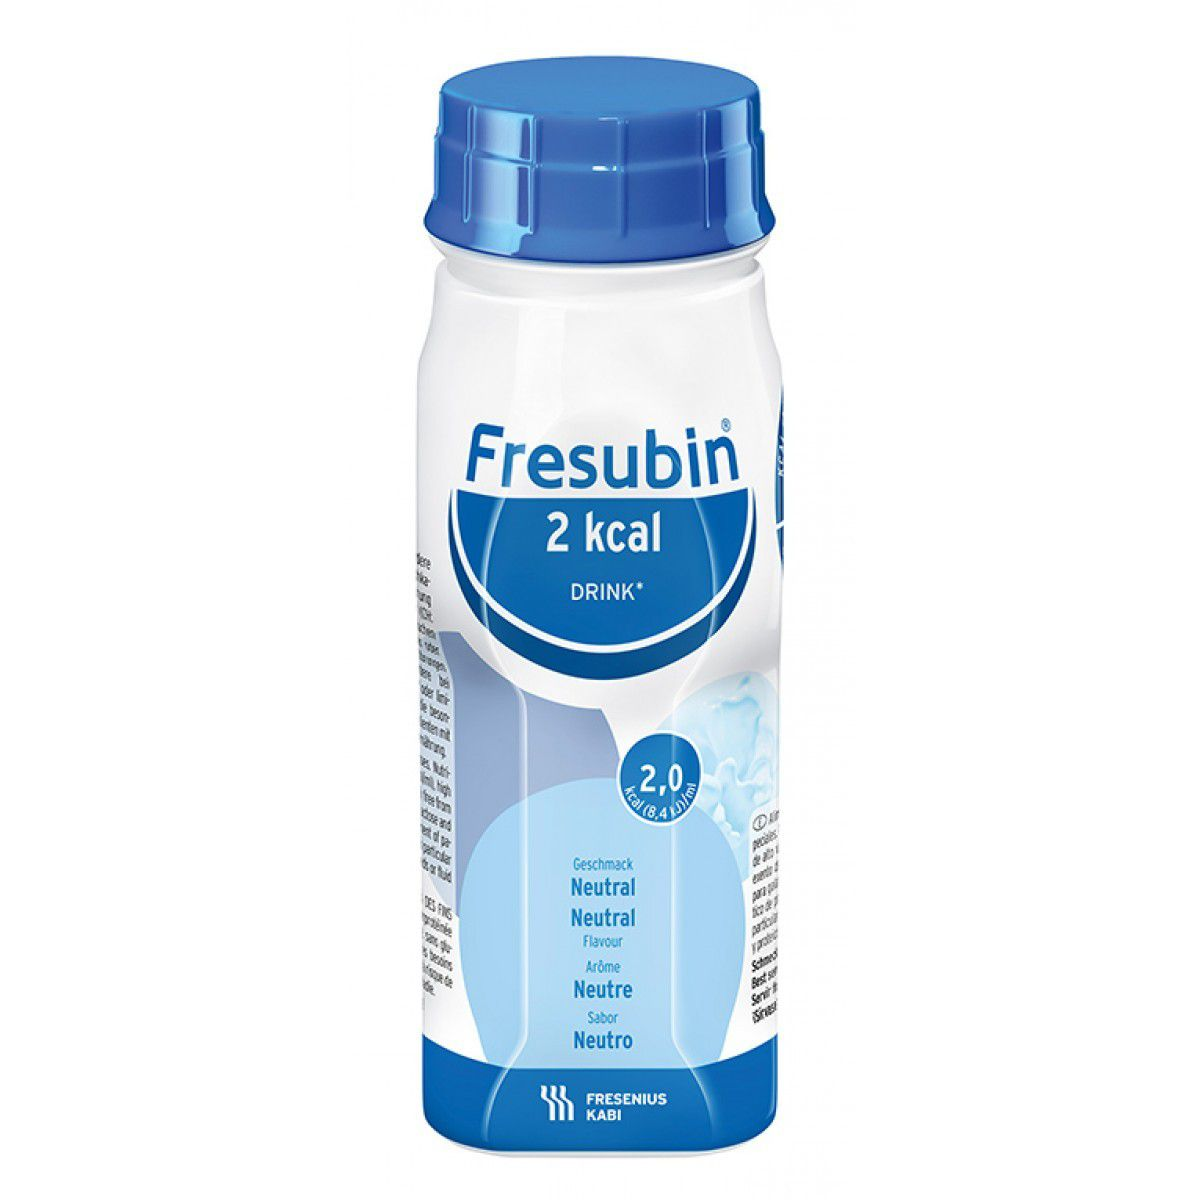 FRESUBIN 2 KCAL DRINK NEUTRO 200ML (KIT 24 UNDS) - FRESENIUS